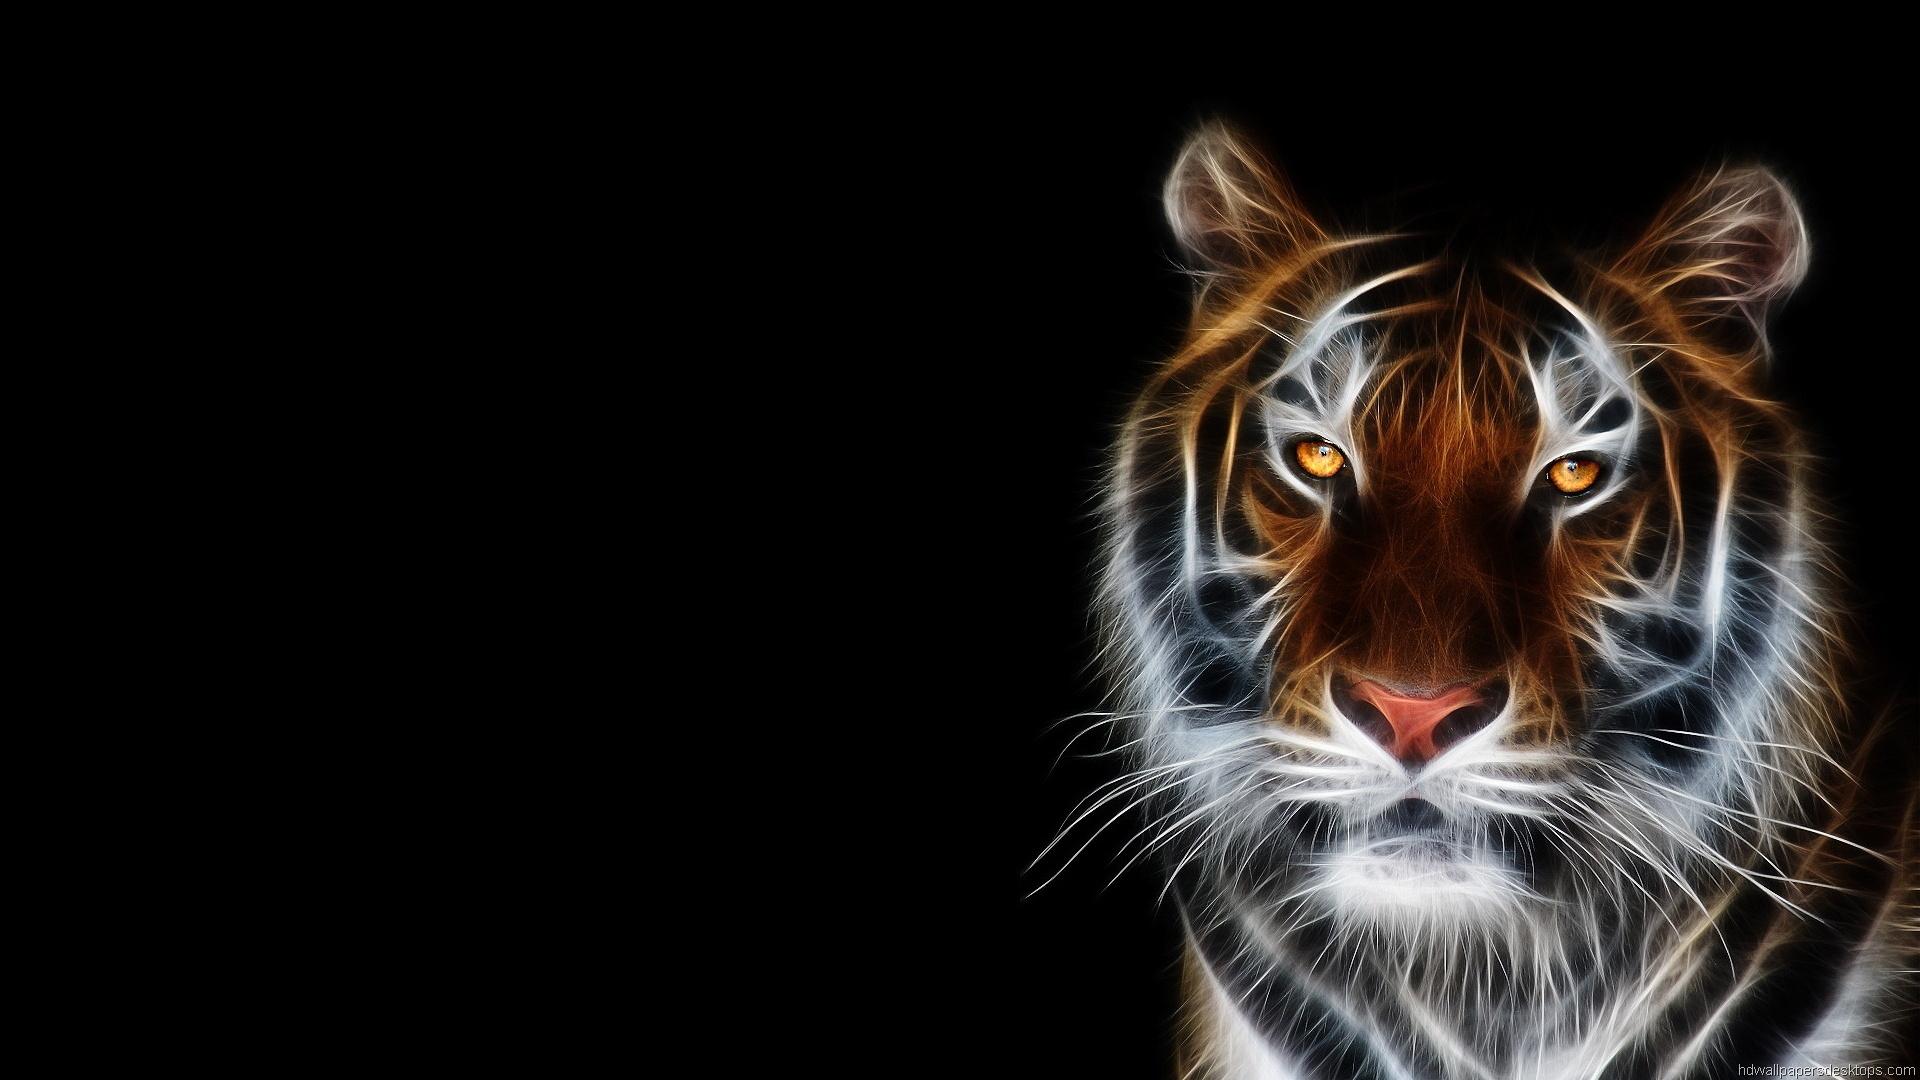 Animals Wallpapers HD Widescreen Desktop Backgrounds 1920x1080 1920x1080